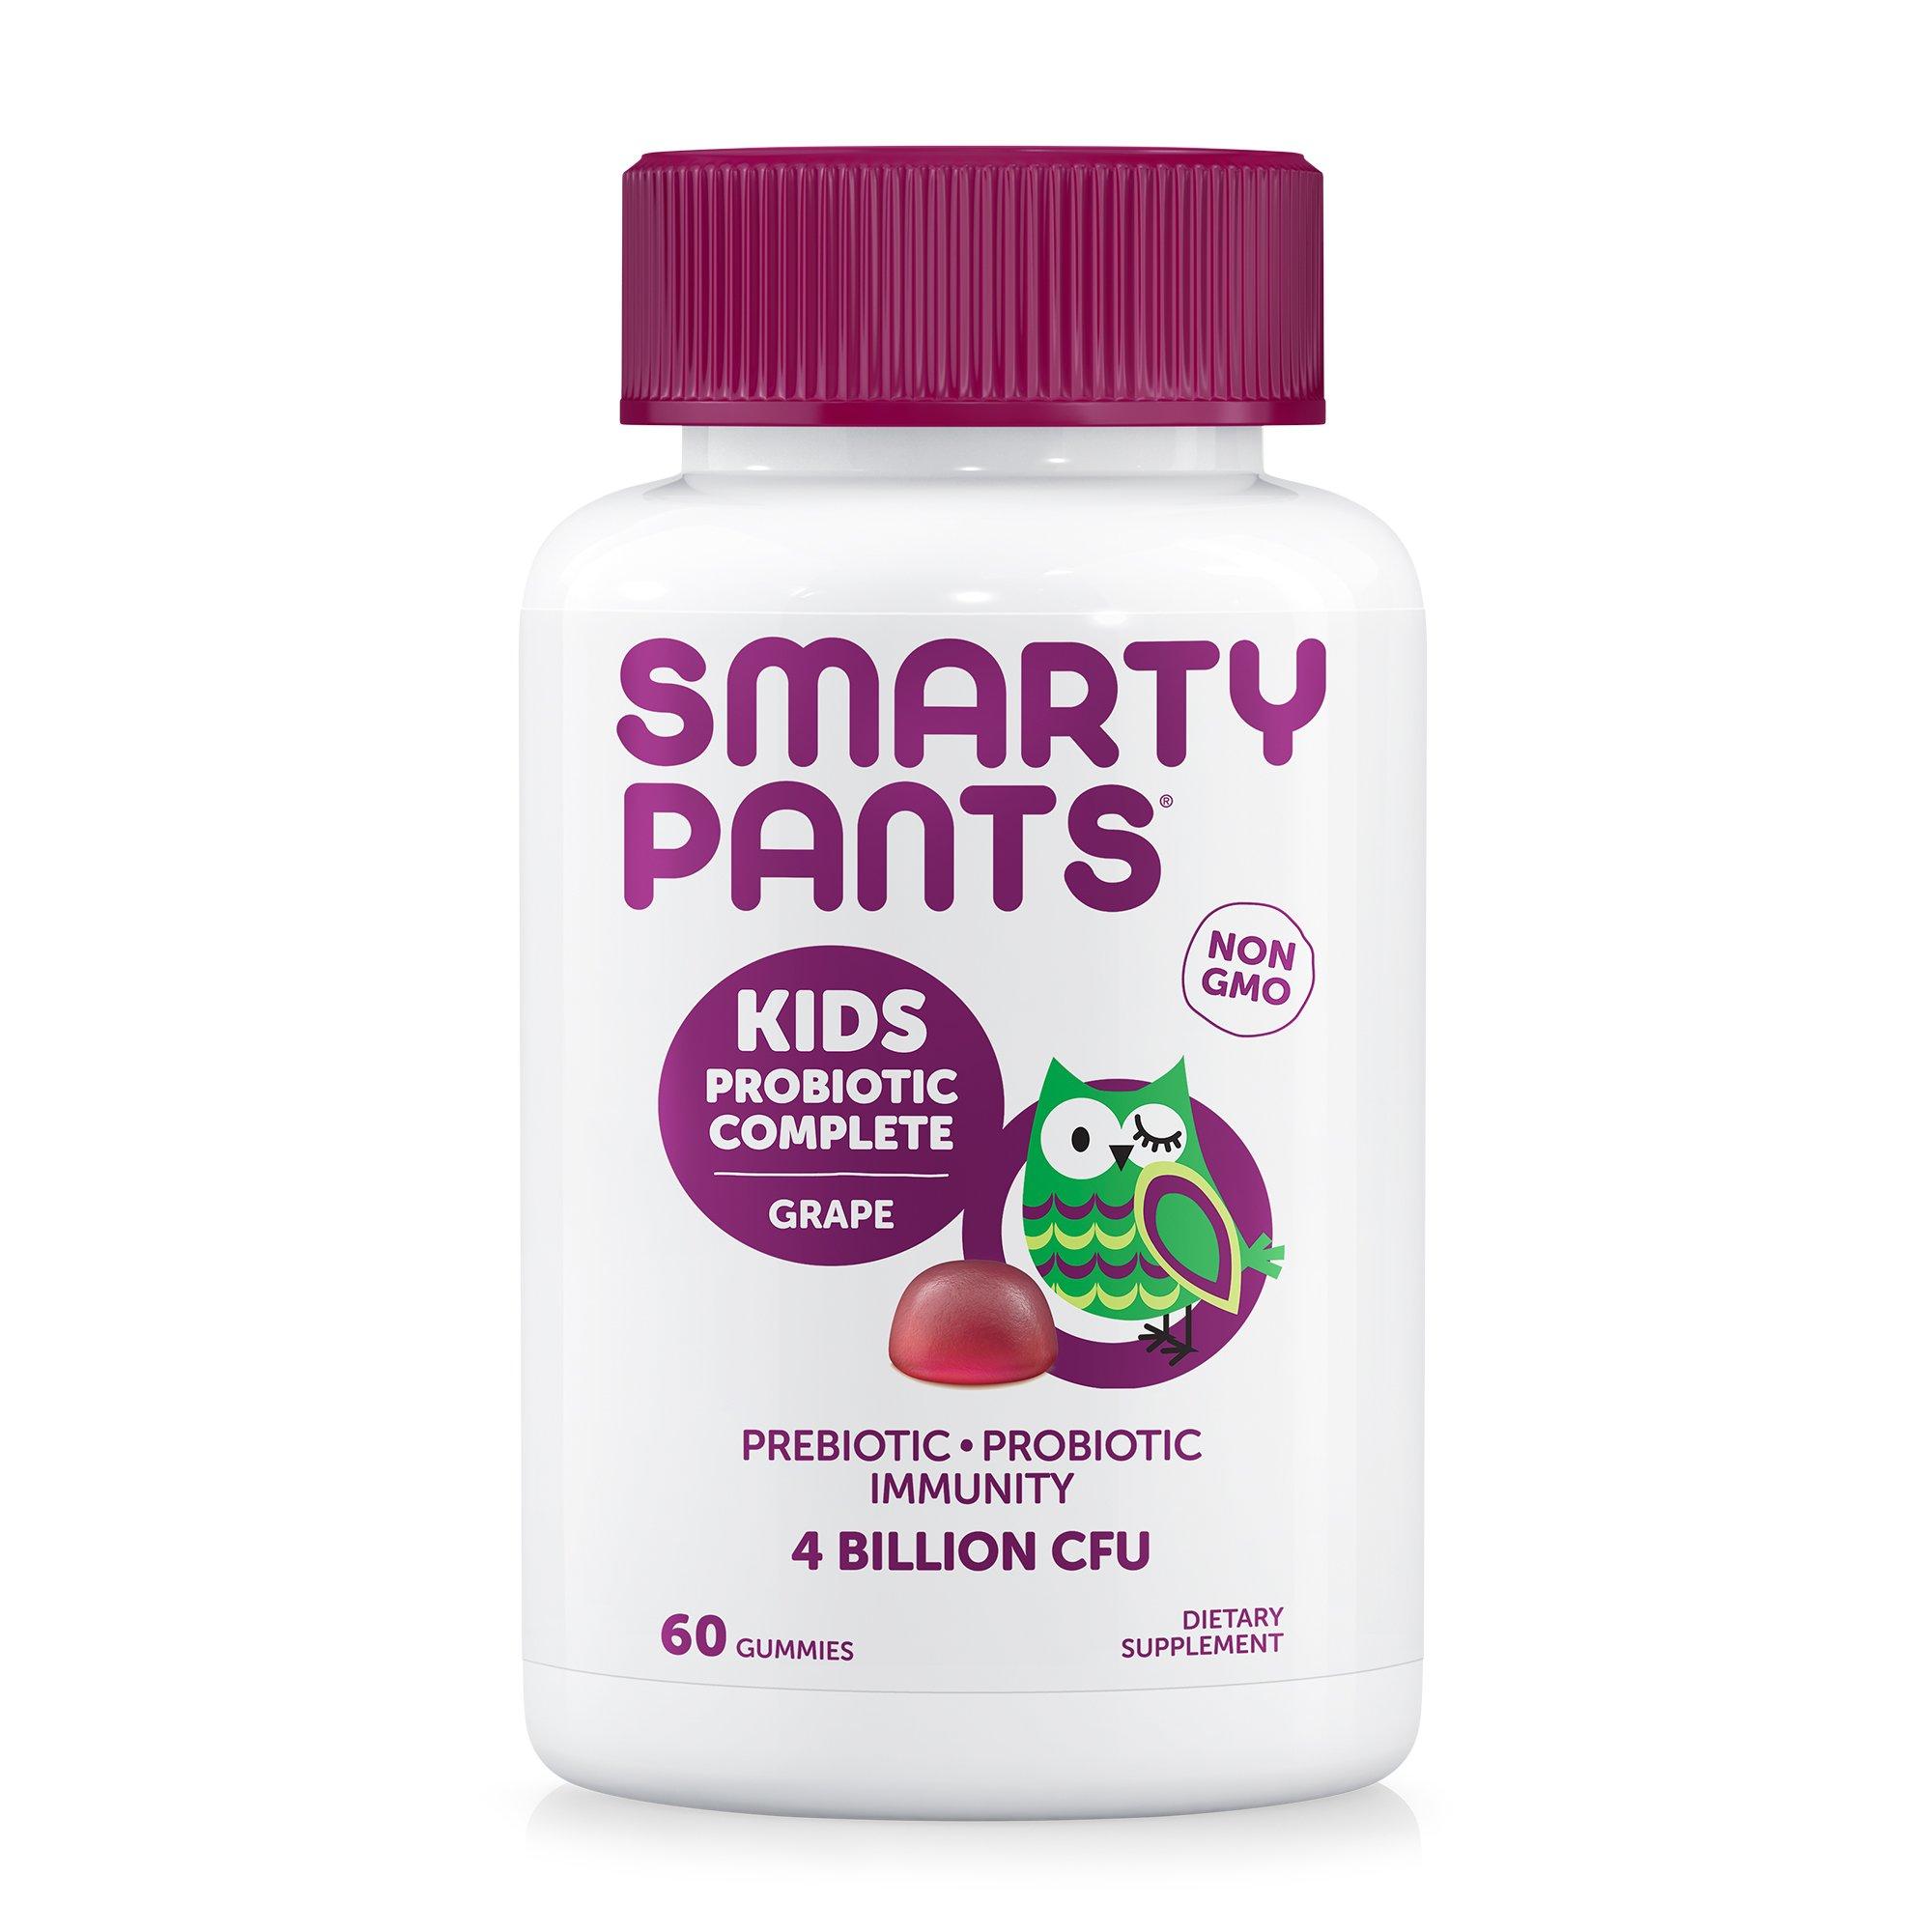 SmartyPants Kids Probiotic Complete; Probiotics & Prebiotics; Digestive & Immune Support* Gummies; 4 billion CFU, VEGAN, NON-GMO, NO REFRIGERATION REQUIRED, Grape Flavor, 60 Count, 30 Day Supply